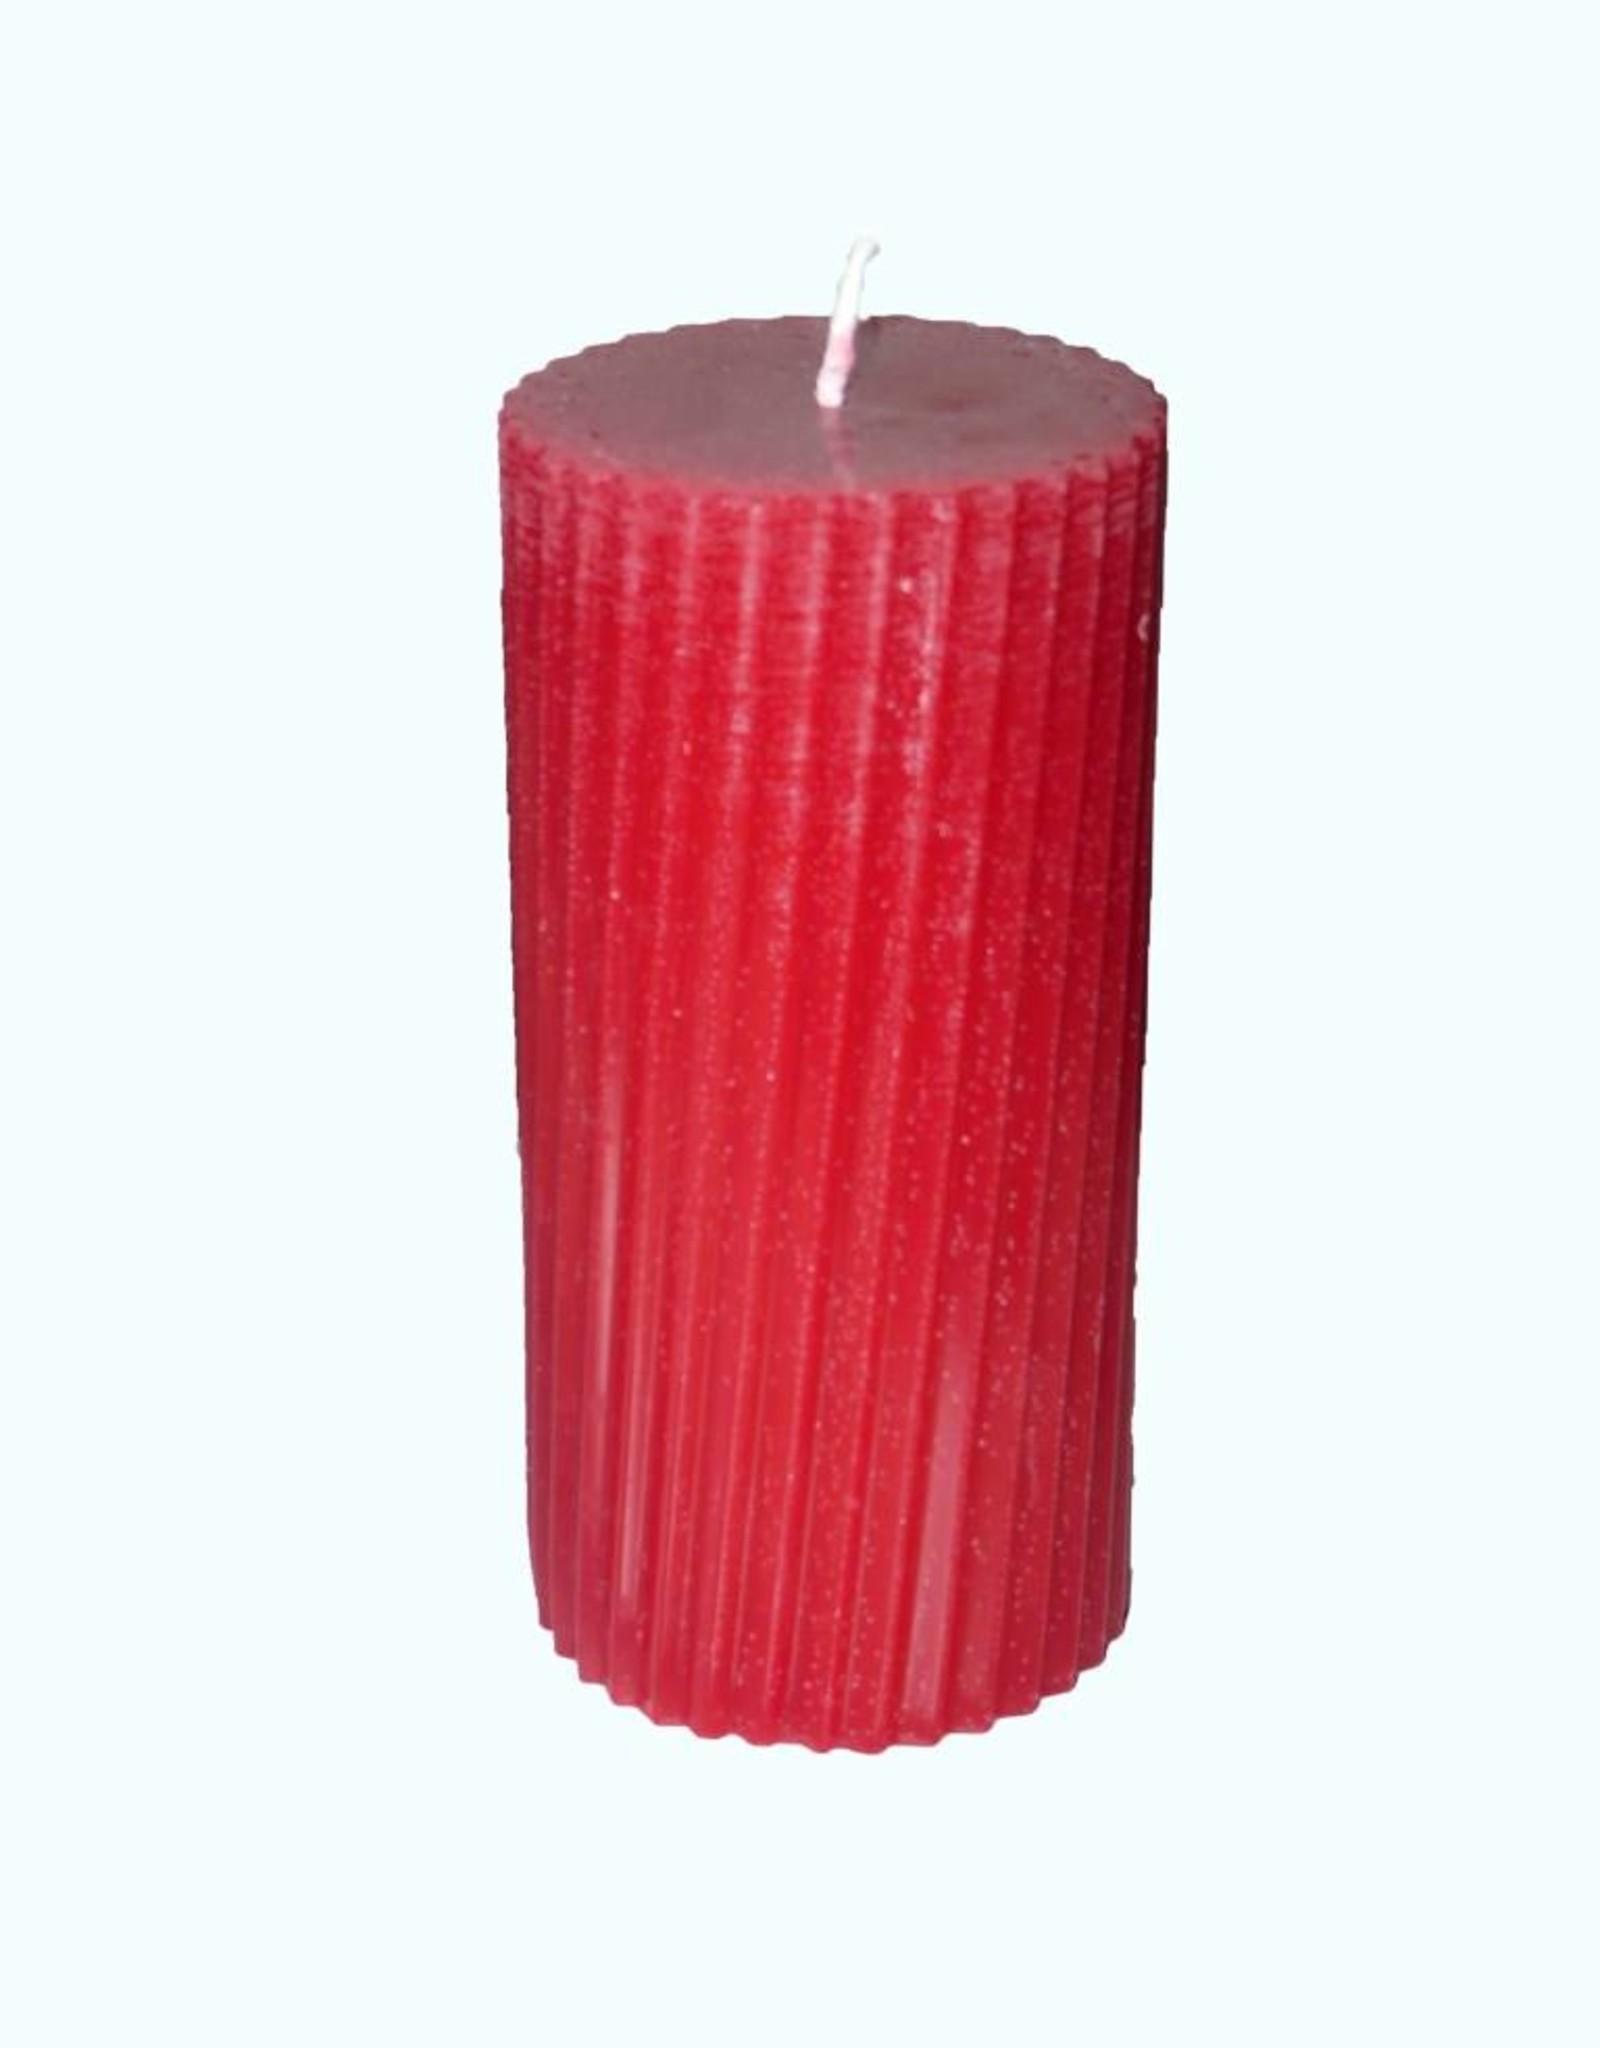 Twisted Stompkaars in de kleur Rood Ø 8x16 cm